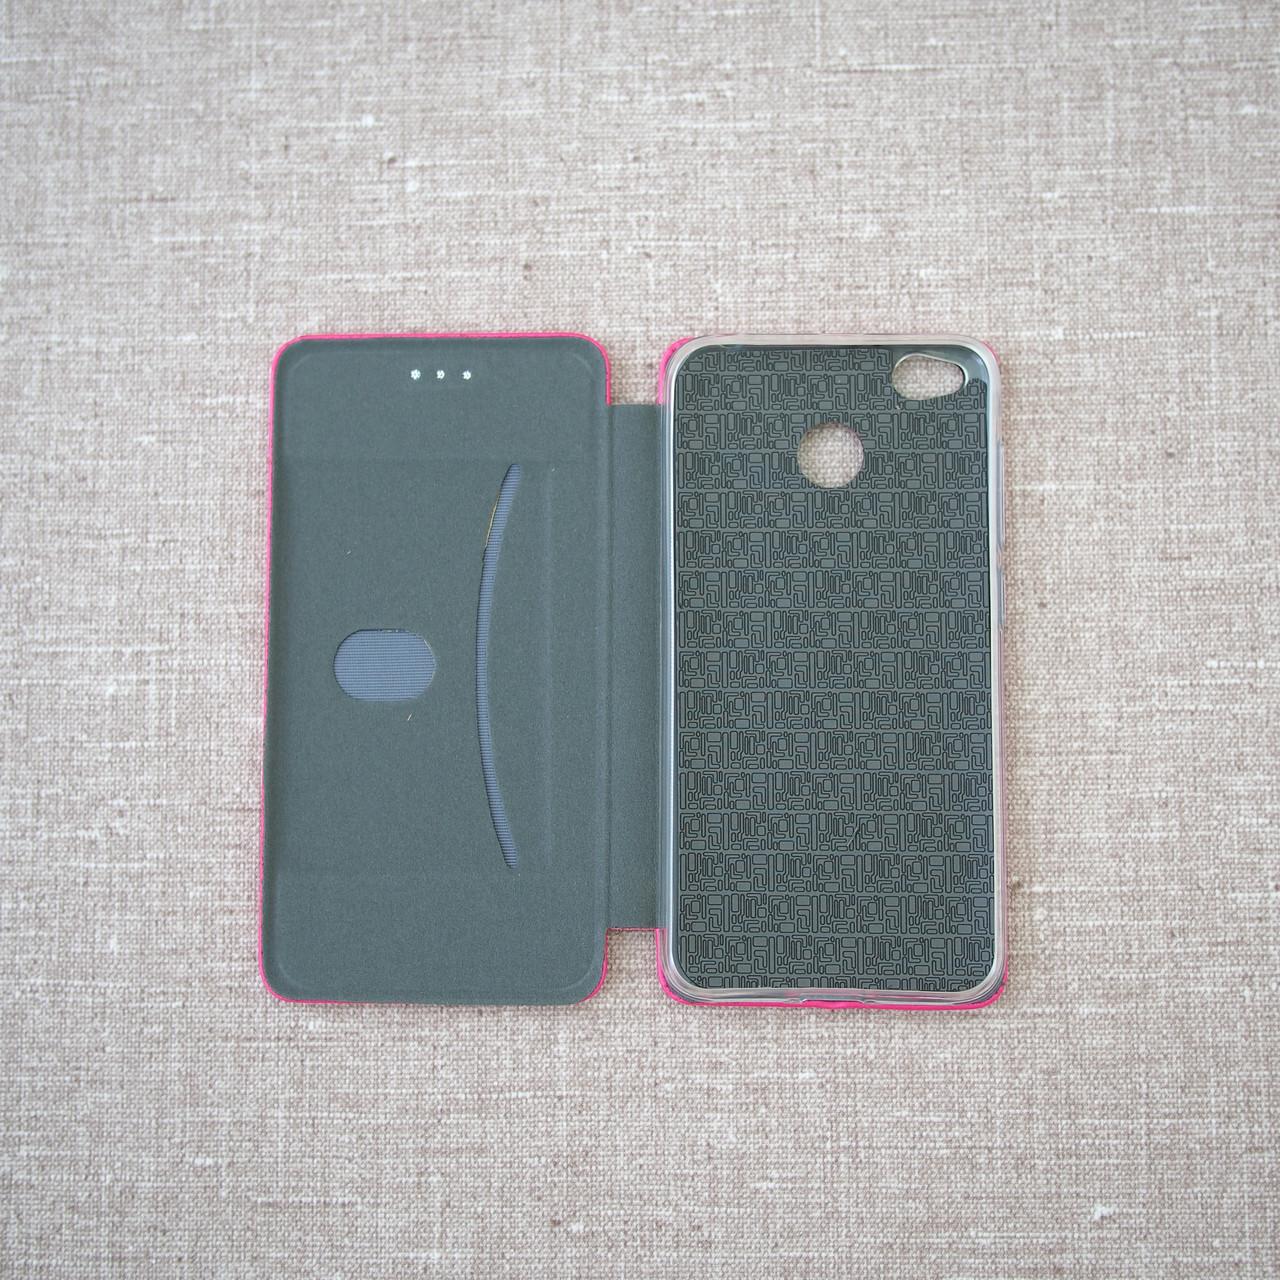 Чехол G-Case Xiaomi redmi 4x pink Redmi 4X Для телефона Розовый